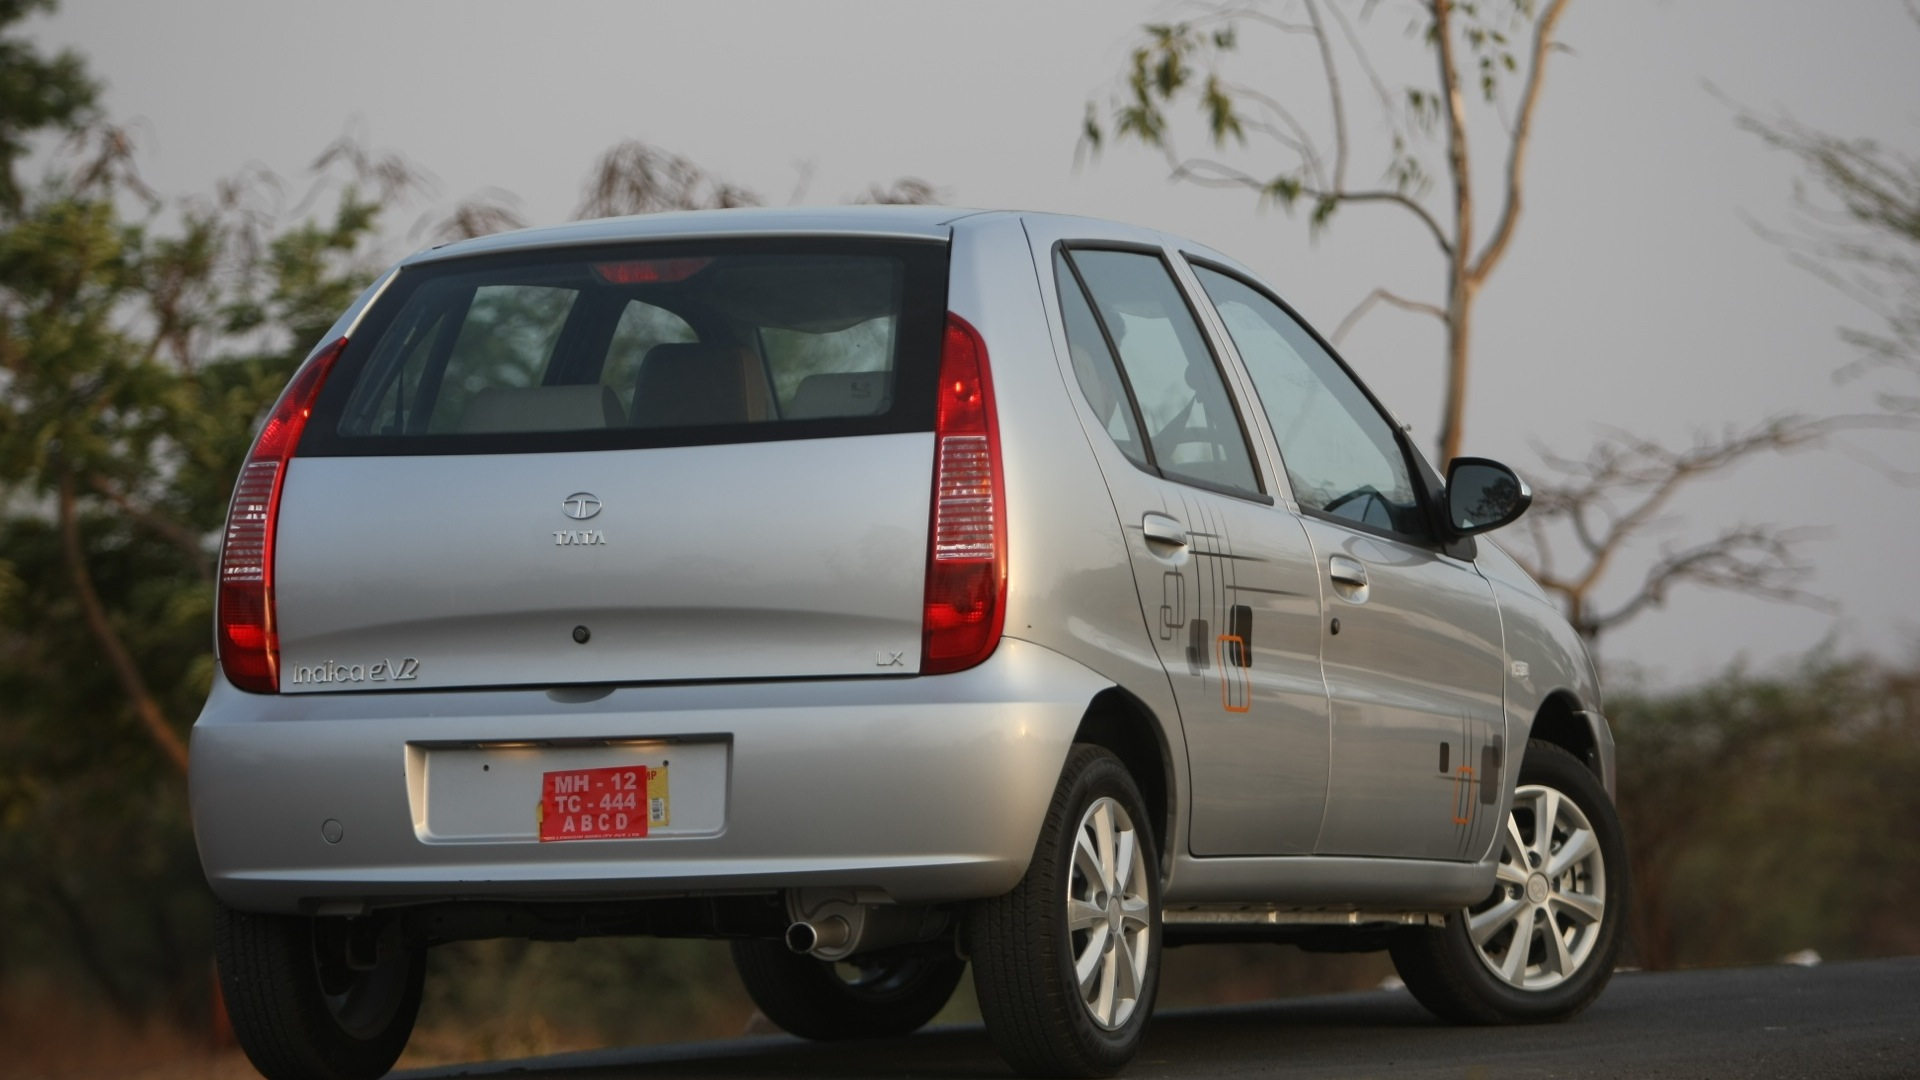 Tata-Indica-2013-eV2-CR4-LE-Exterior